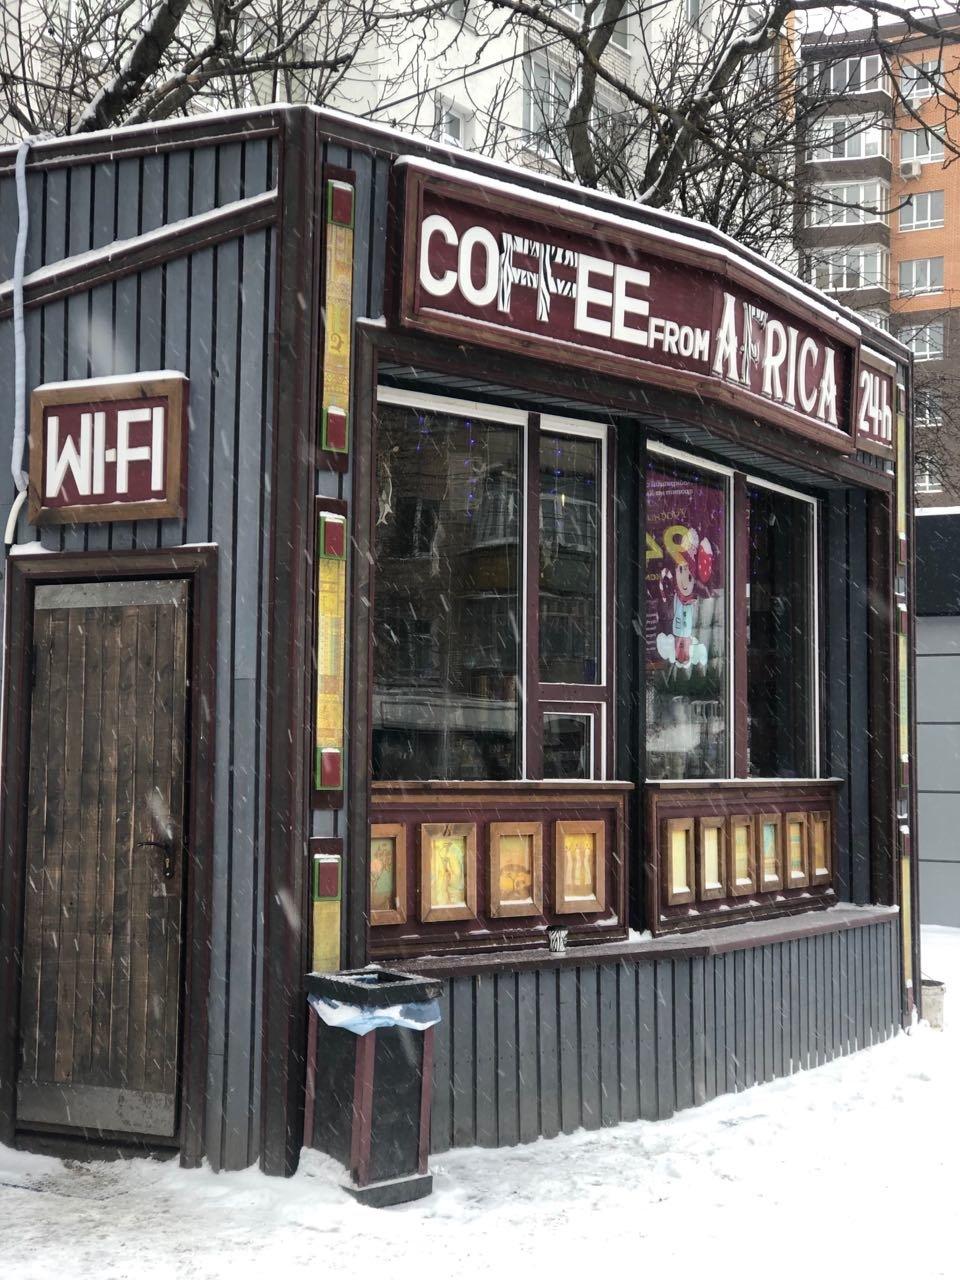 Кохання з присмаком кави: де у Хмельницькому провести День закоханих, фото-4